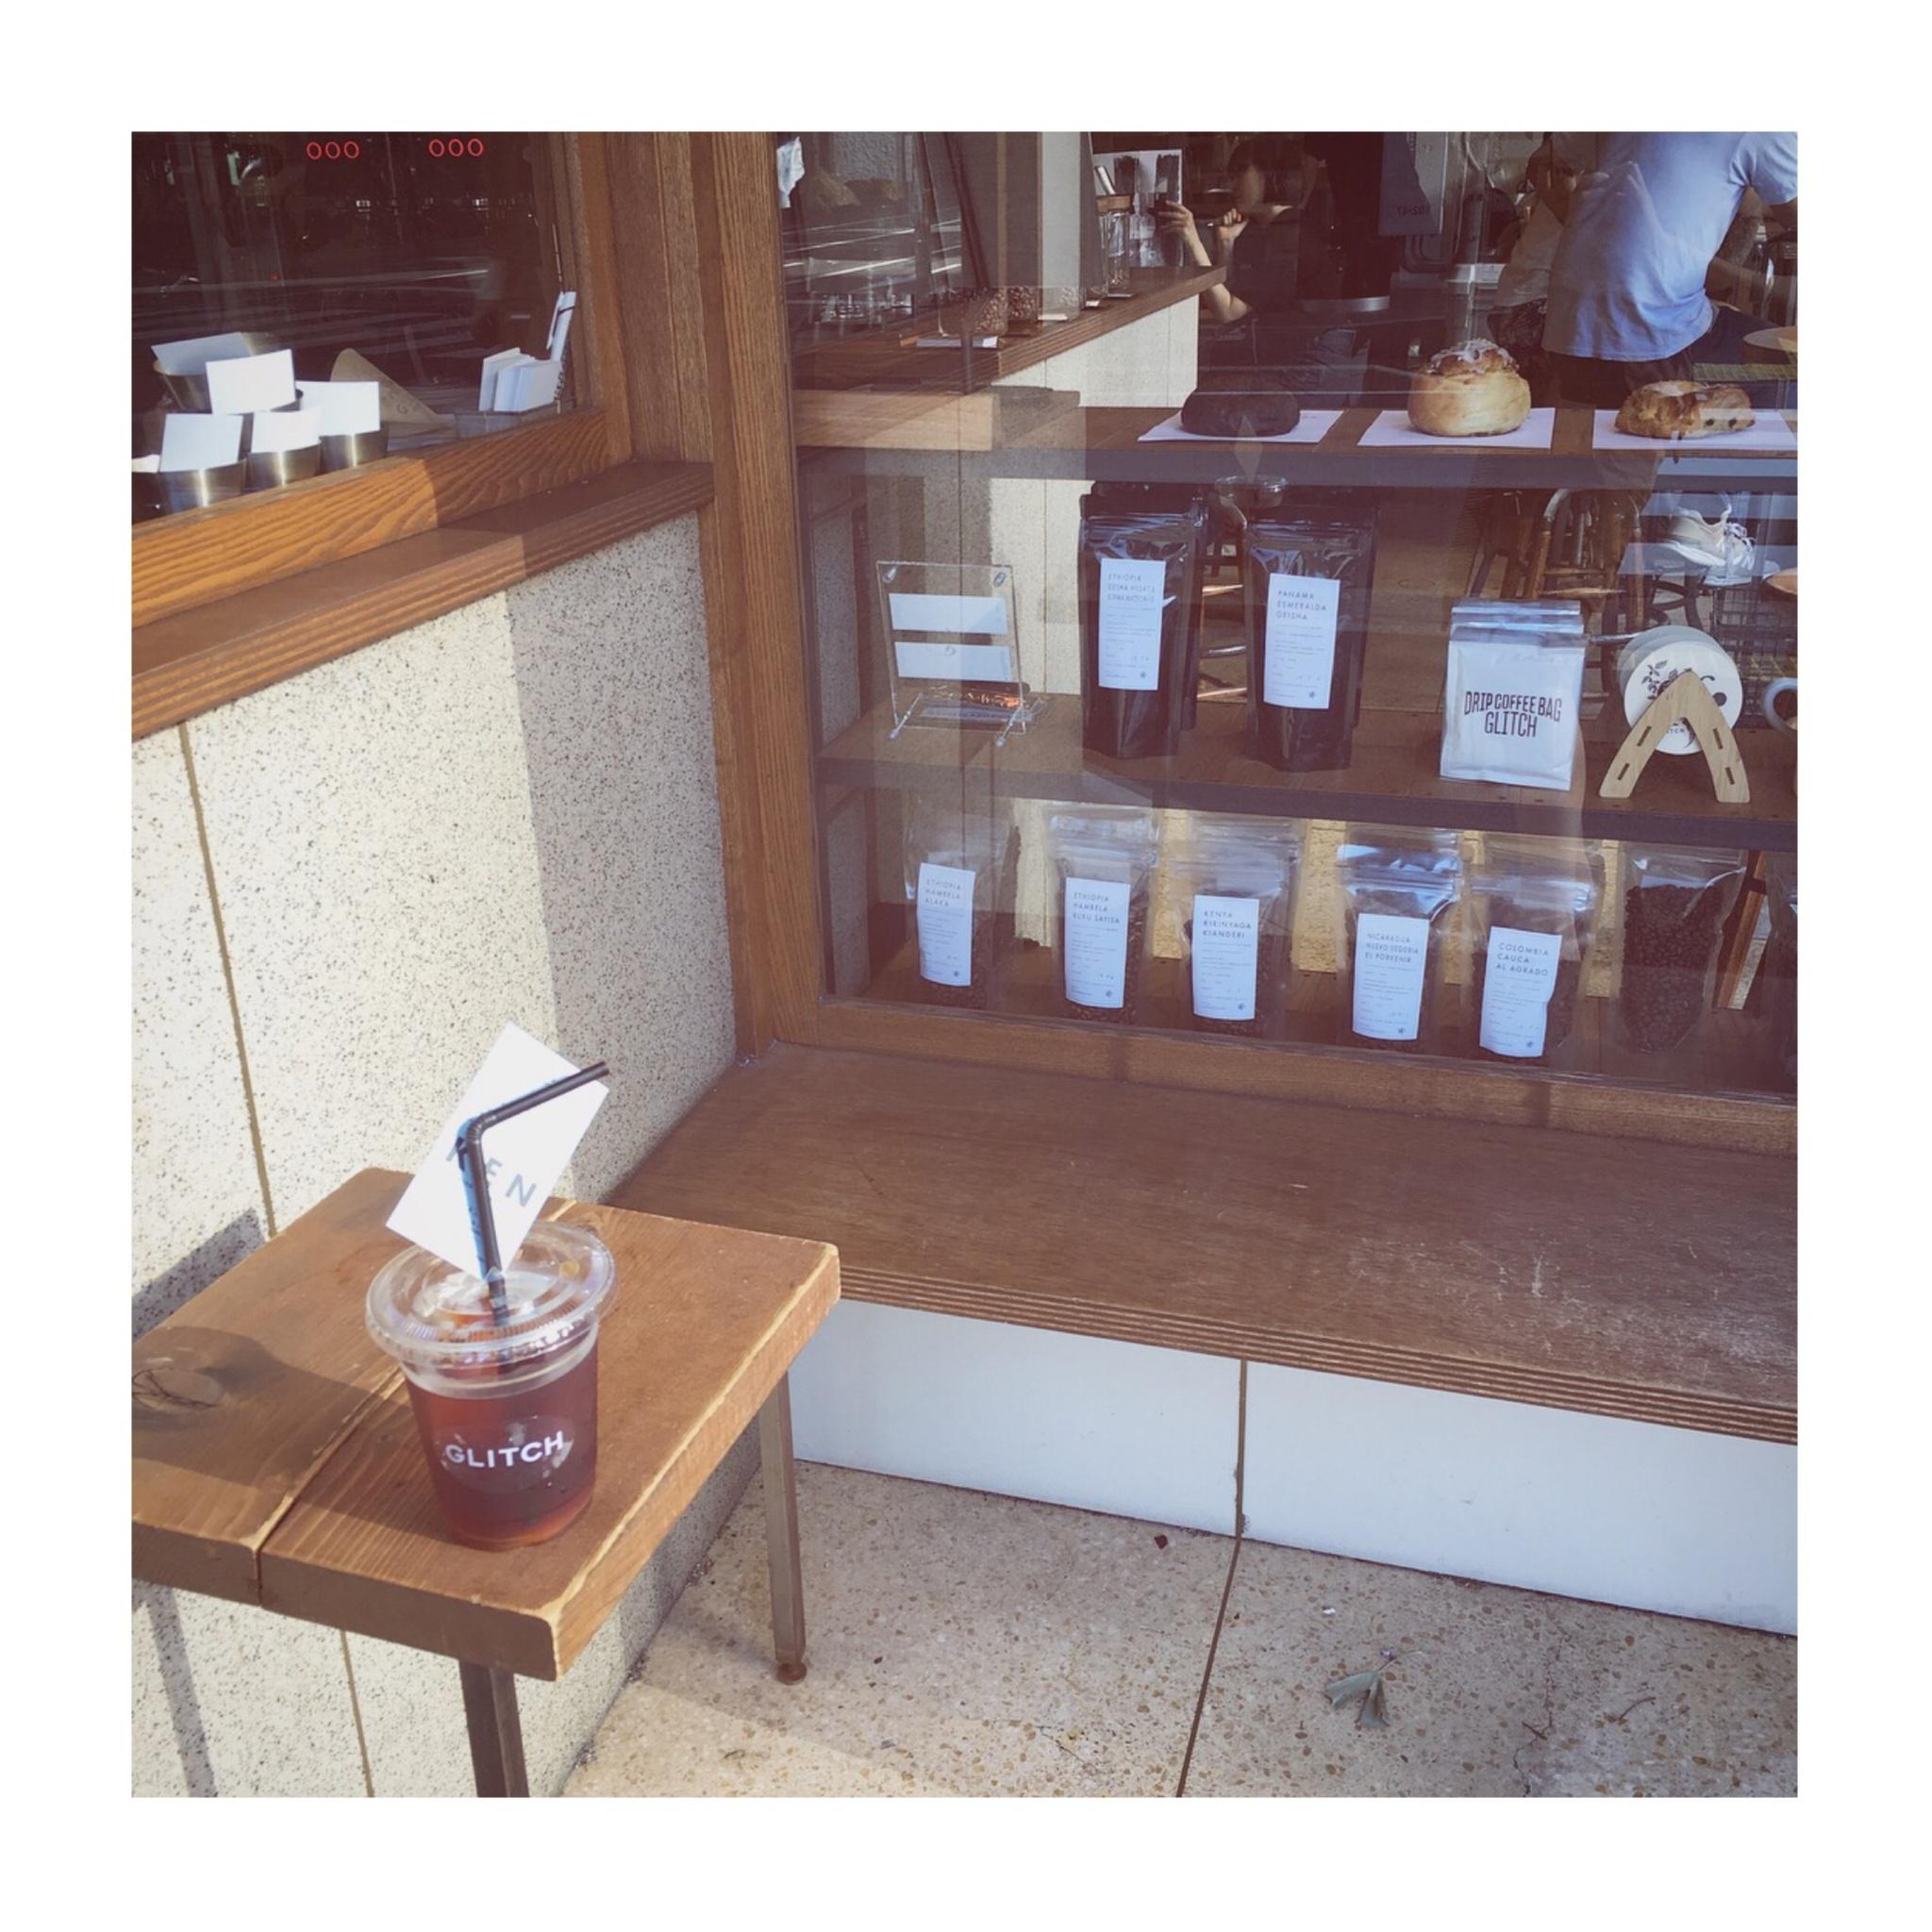 #11【#cafestagram】❤️:《東京•神保町》駅近!居心地◎なカフェ*「GLITCH COFFEE & ROASTERS」☻_6